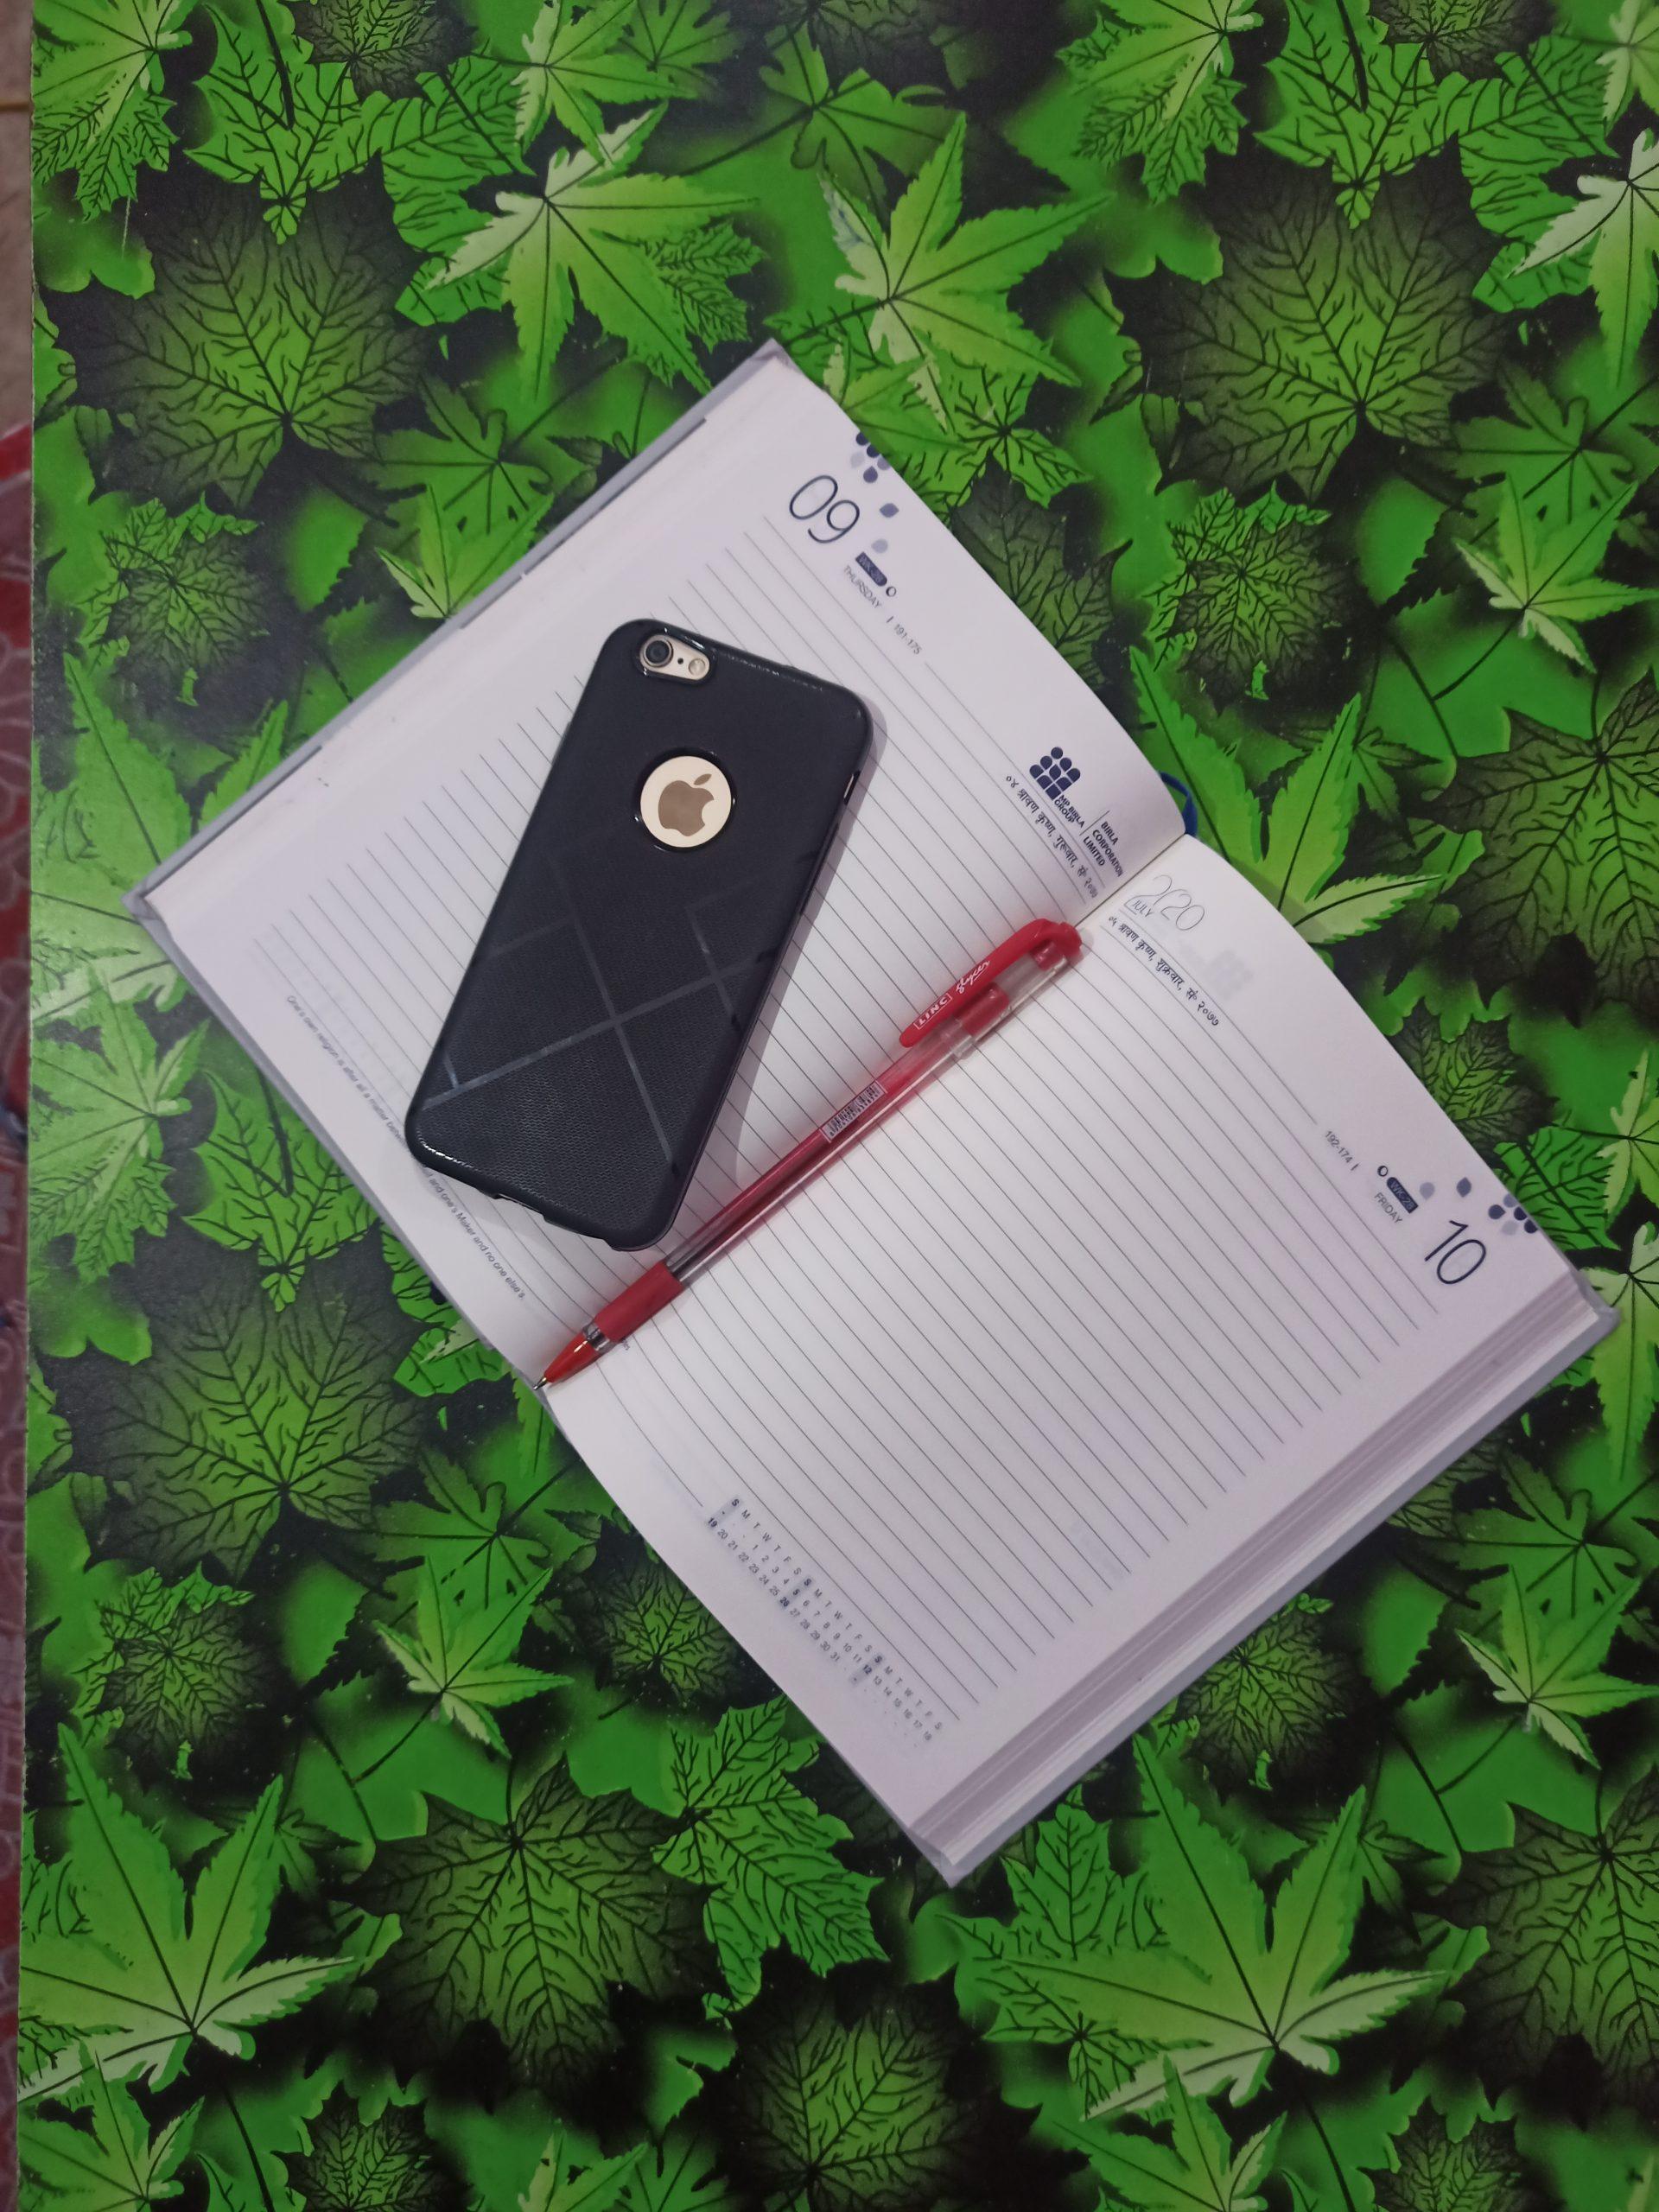 A phone on a diary